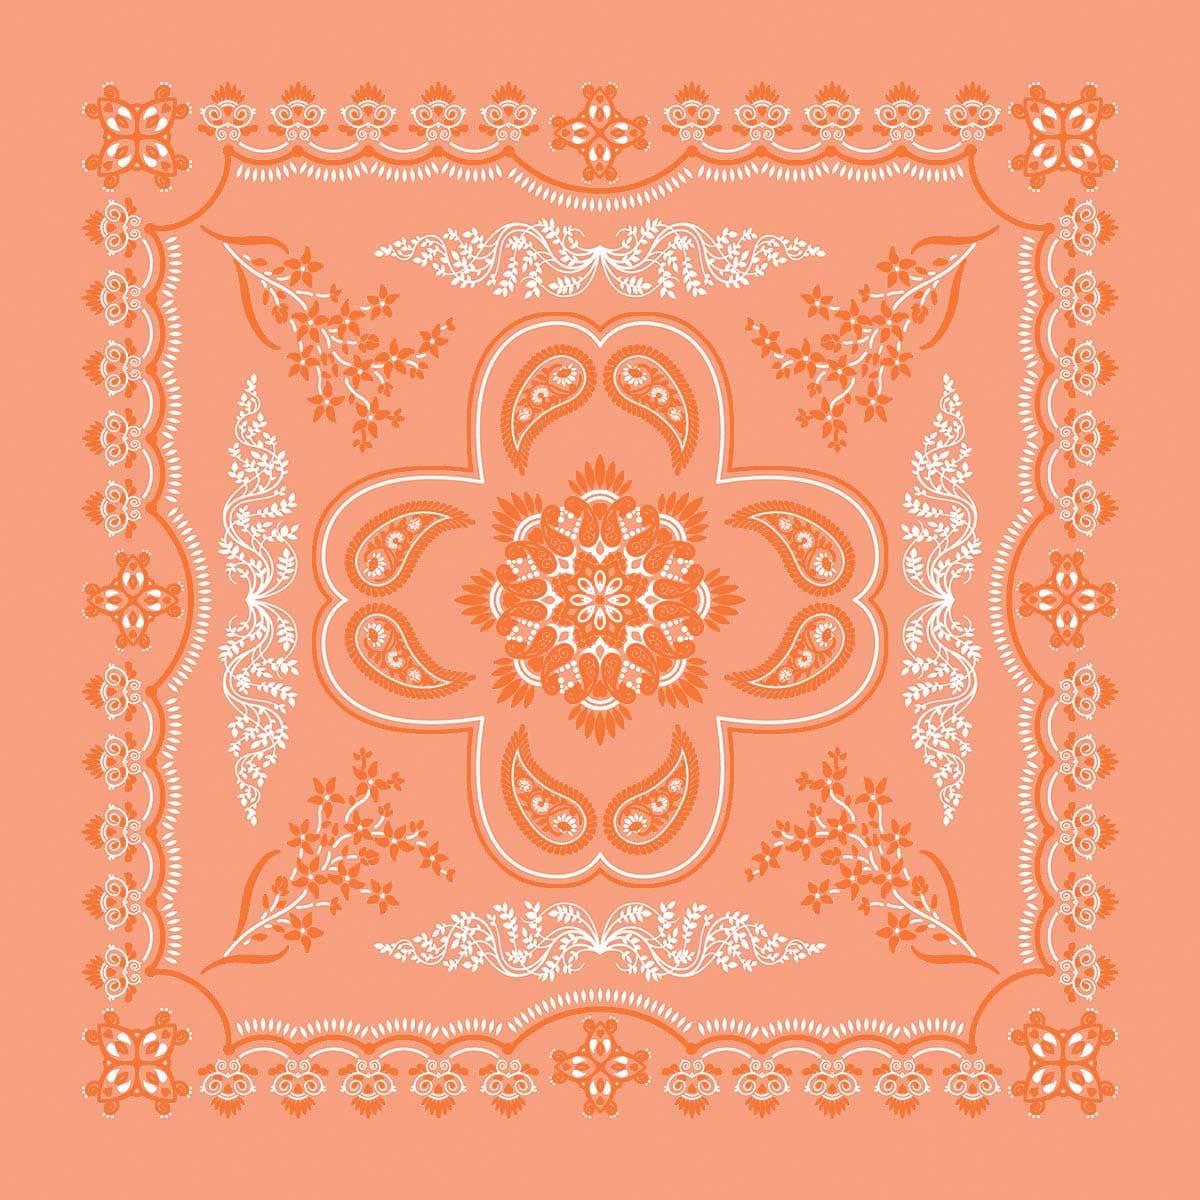 B27PAI-000539-Floral-Paisley-Coral